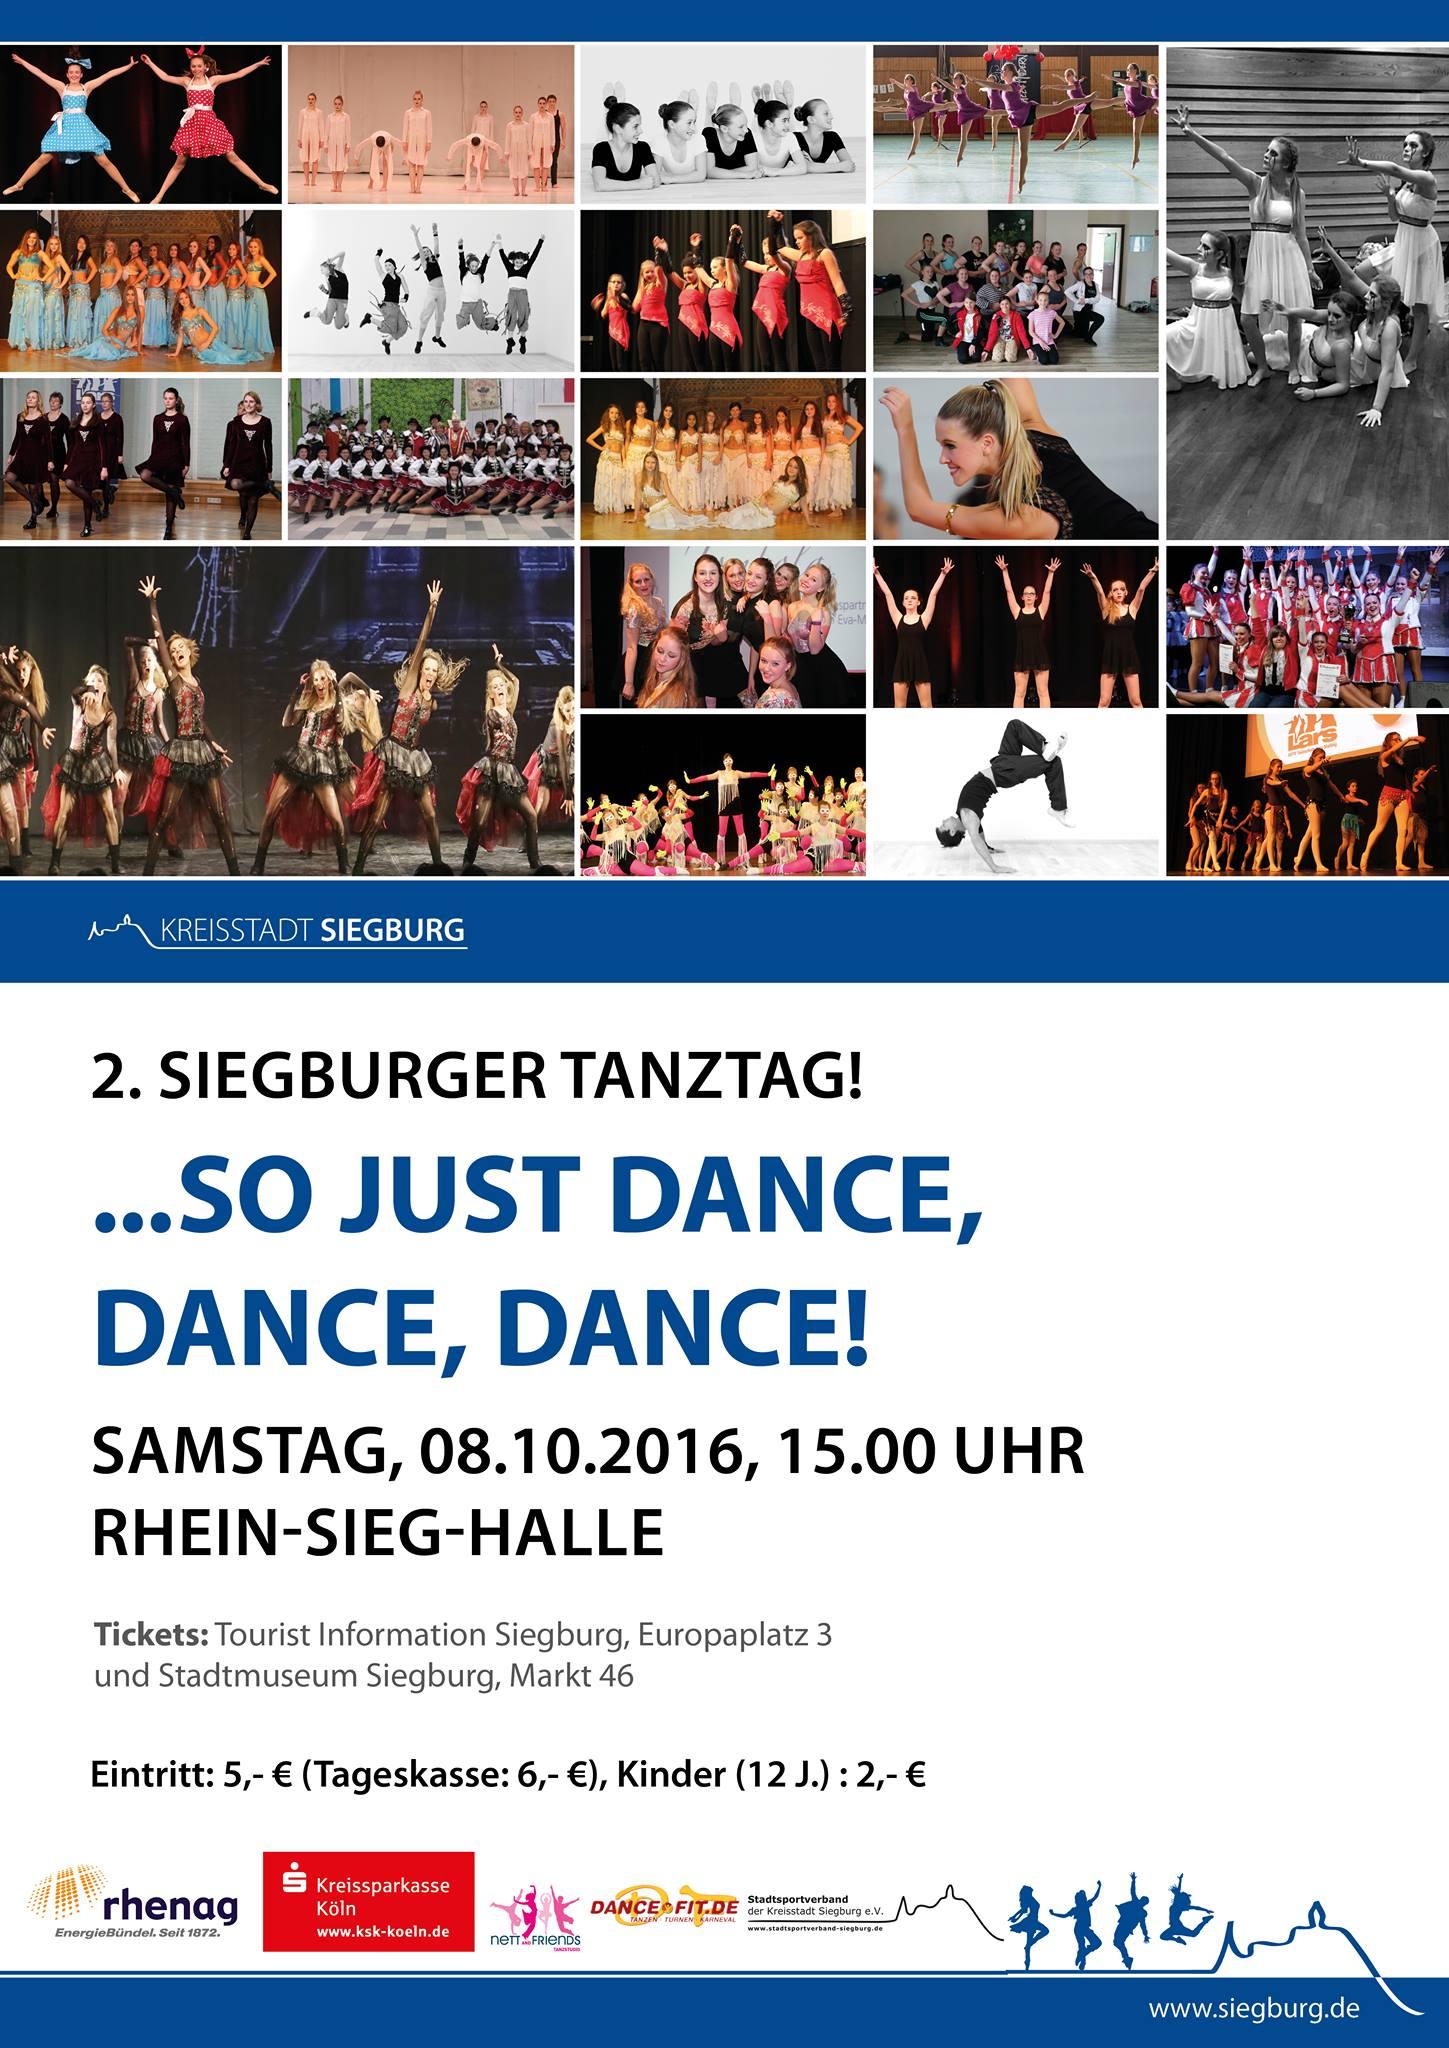 plakat-siegburg-dance-dance-dance